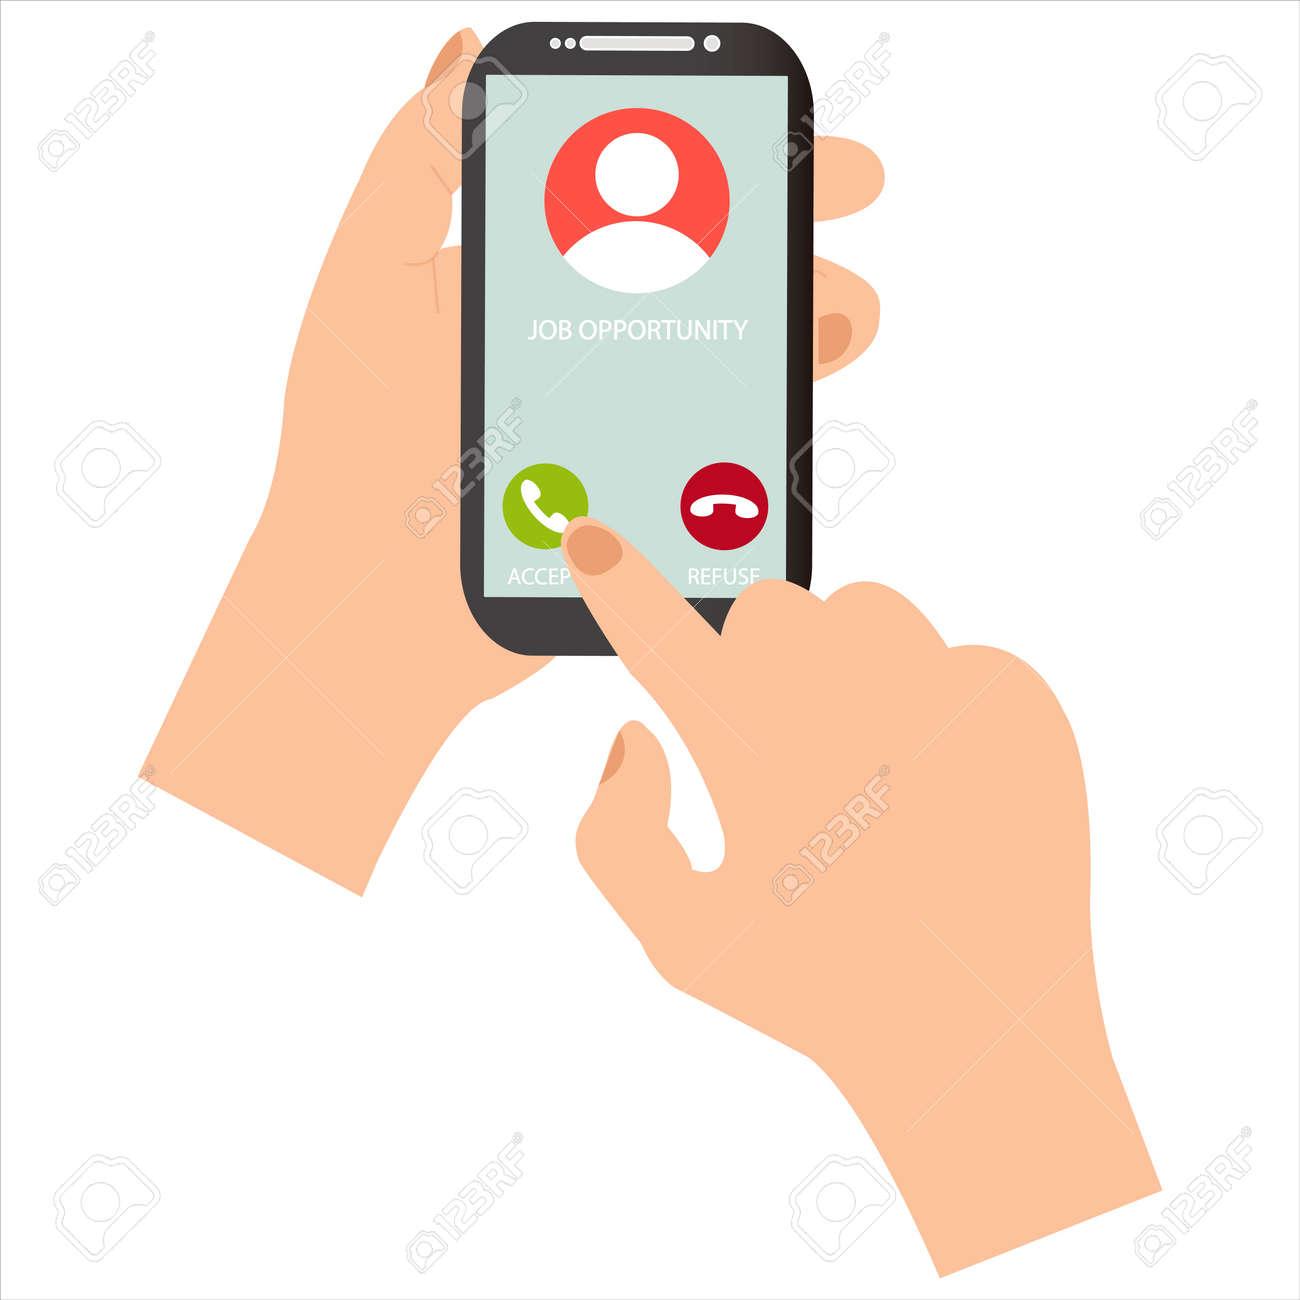 Receive a job offer through a phone call